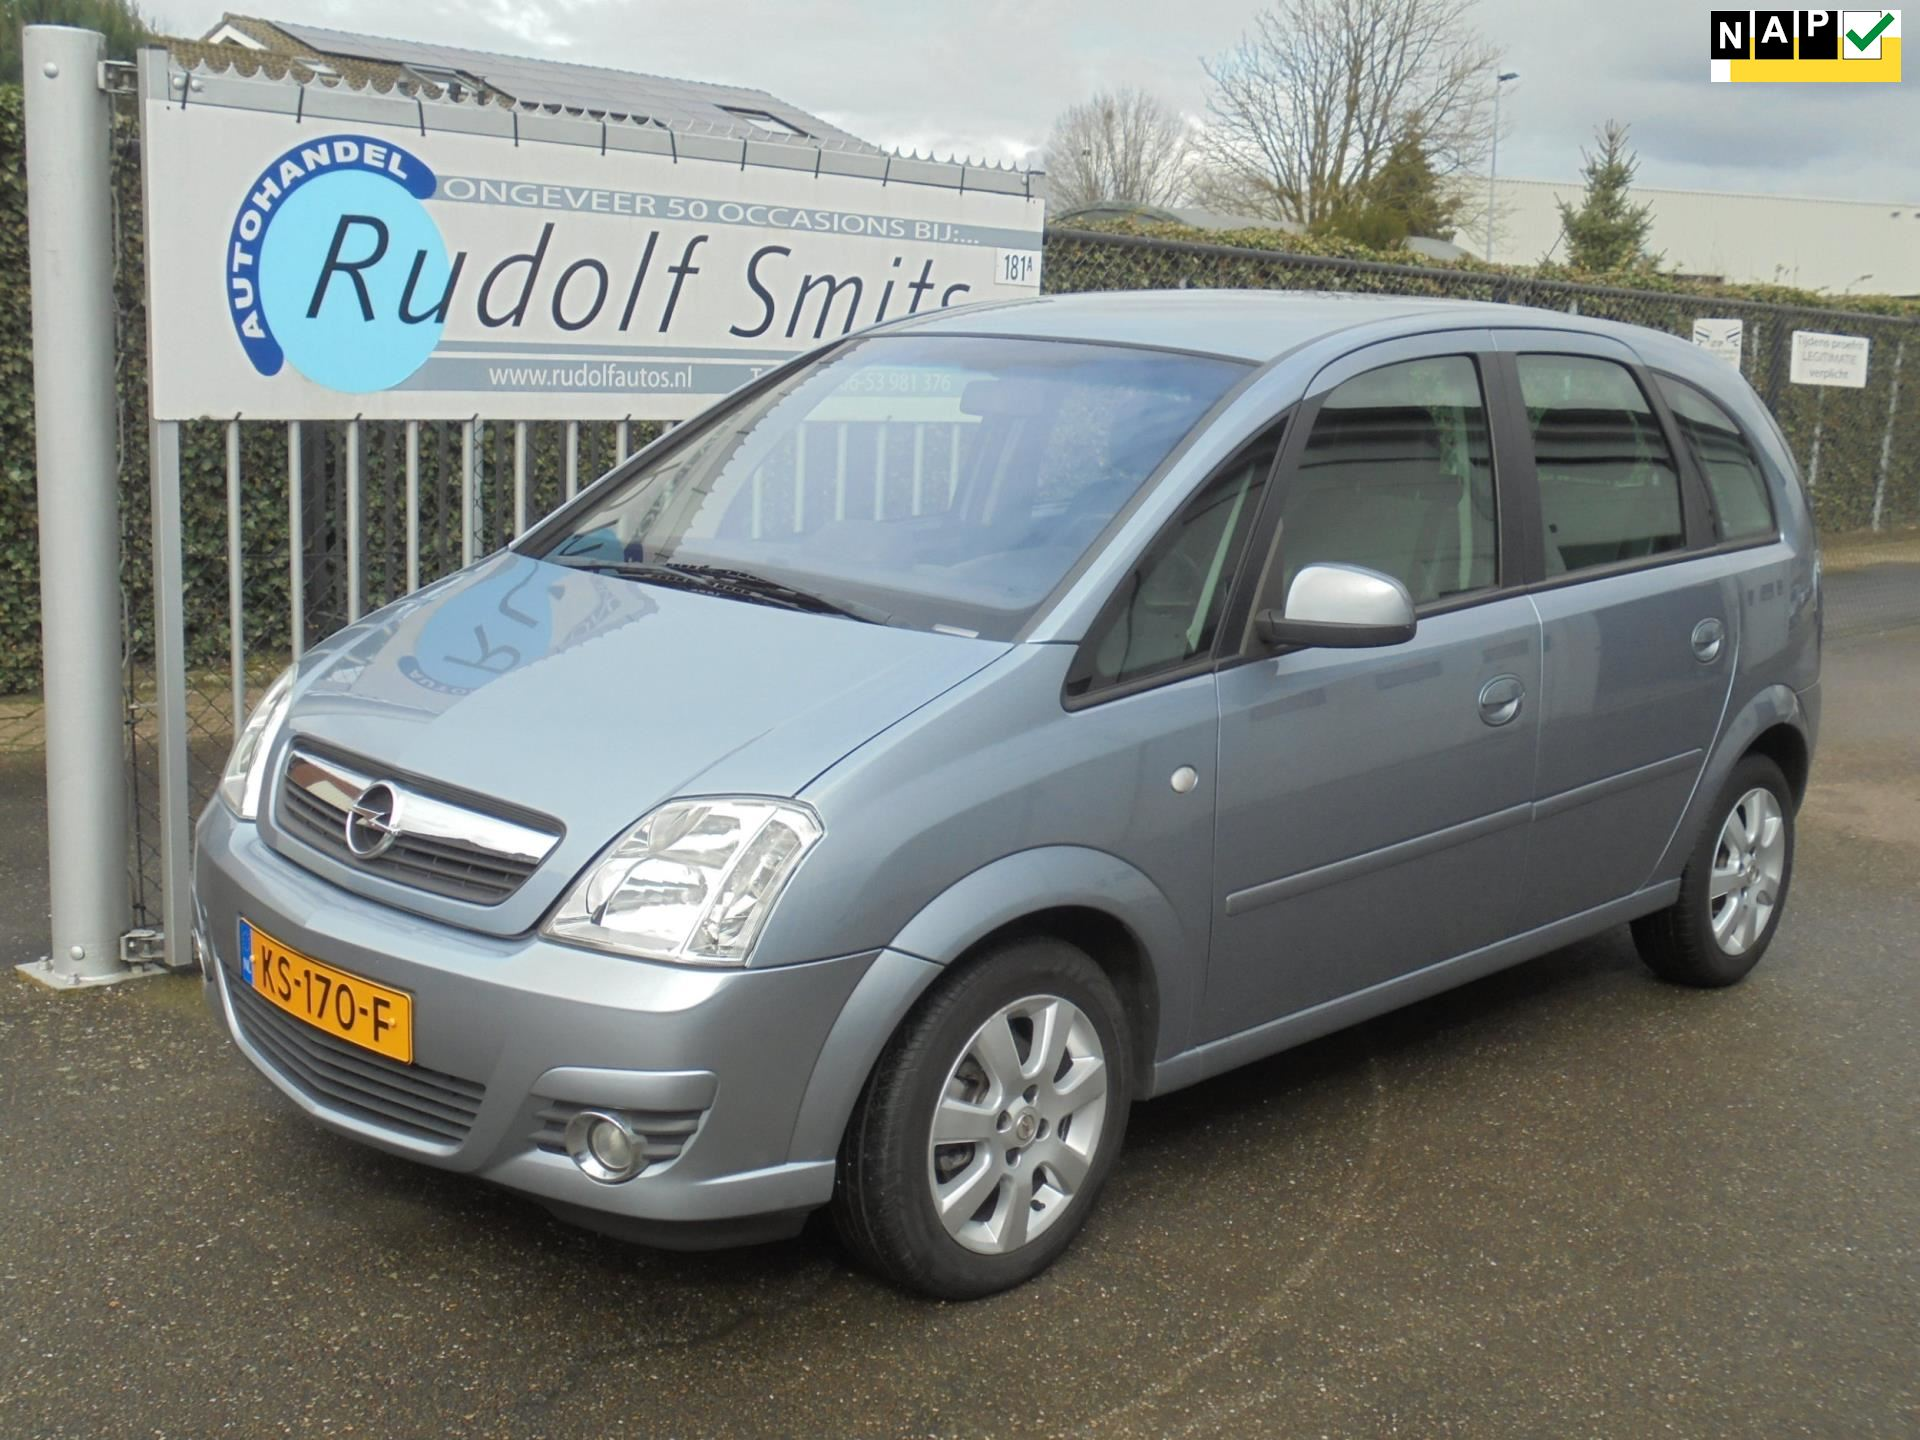 Opel Meriva occasion - Autohandel Rudolf Smits